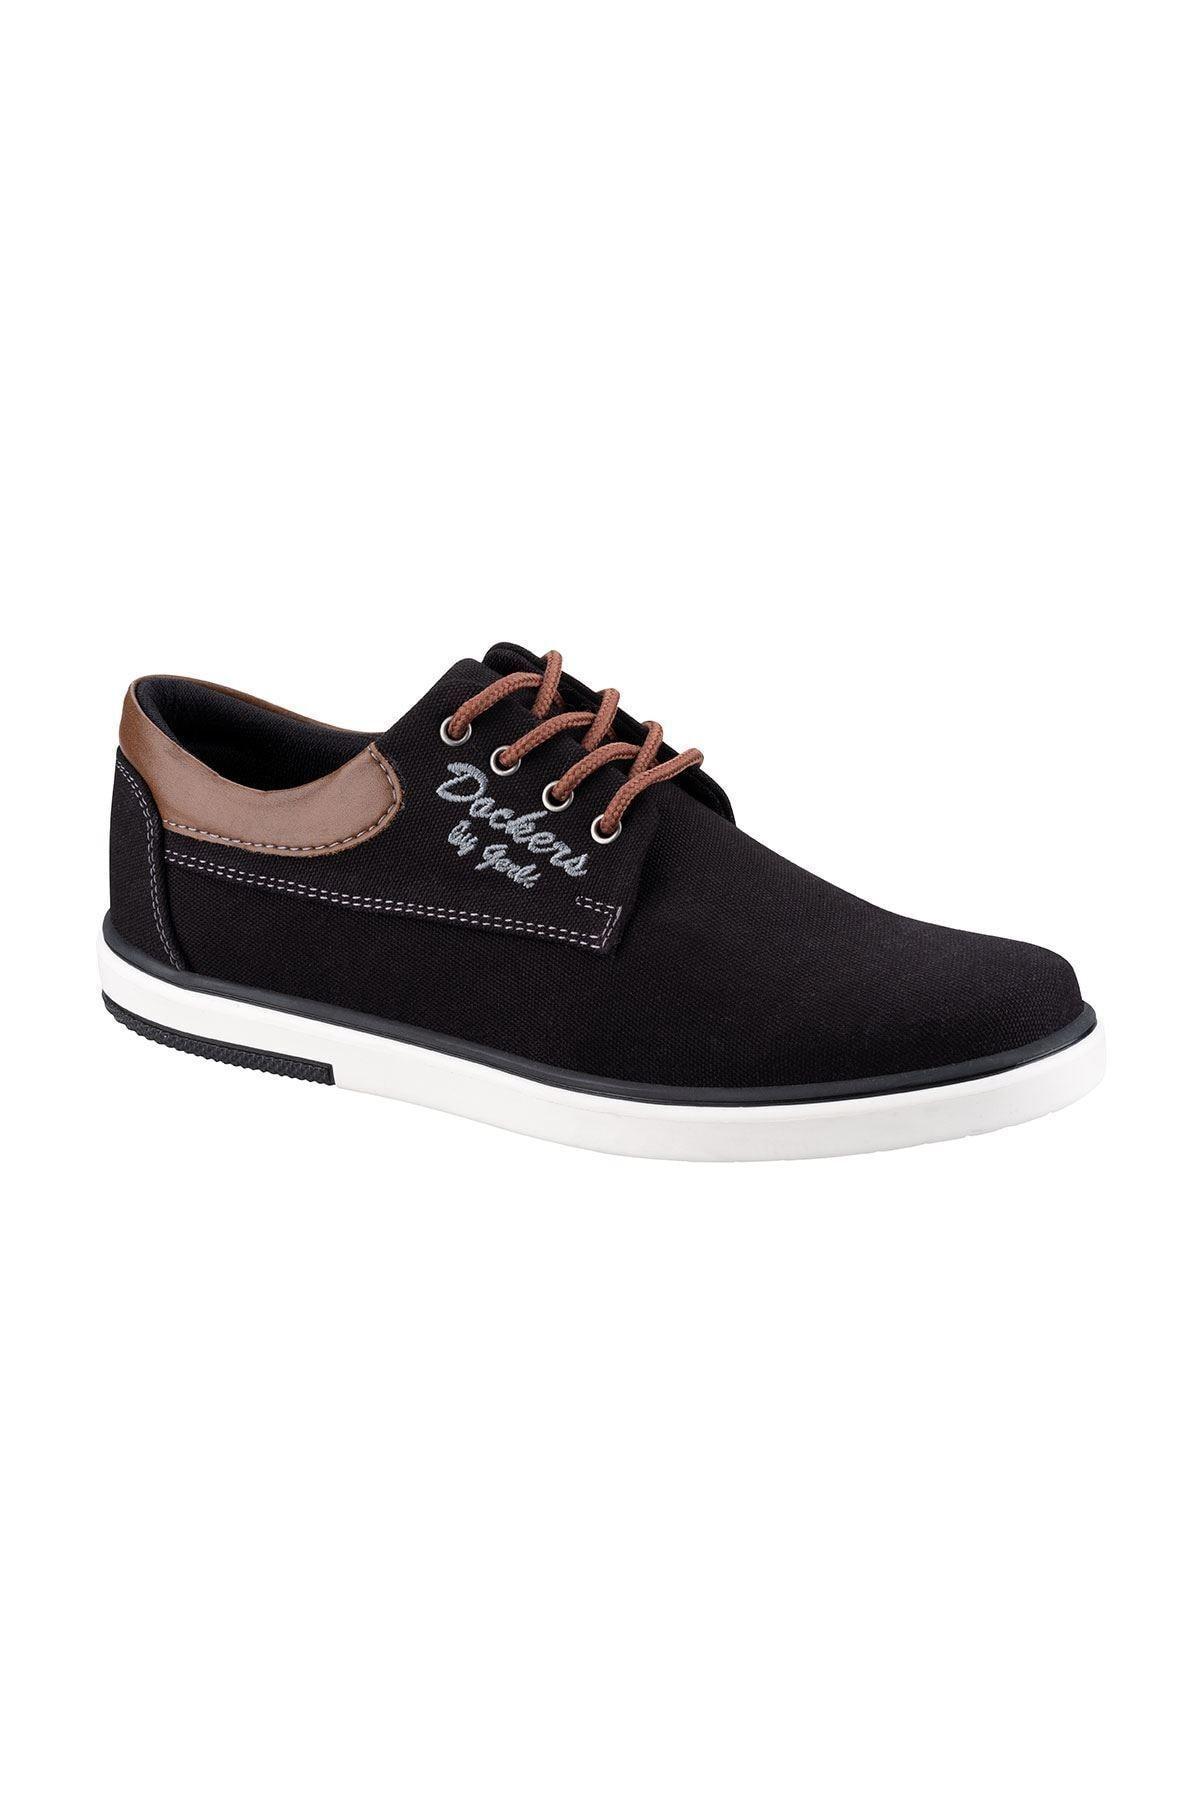 224942 1FX Siyah Erkek Sneaker Ayakkabı 100781236